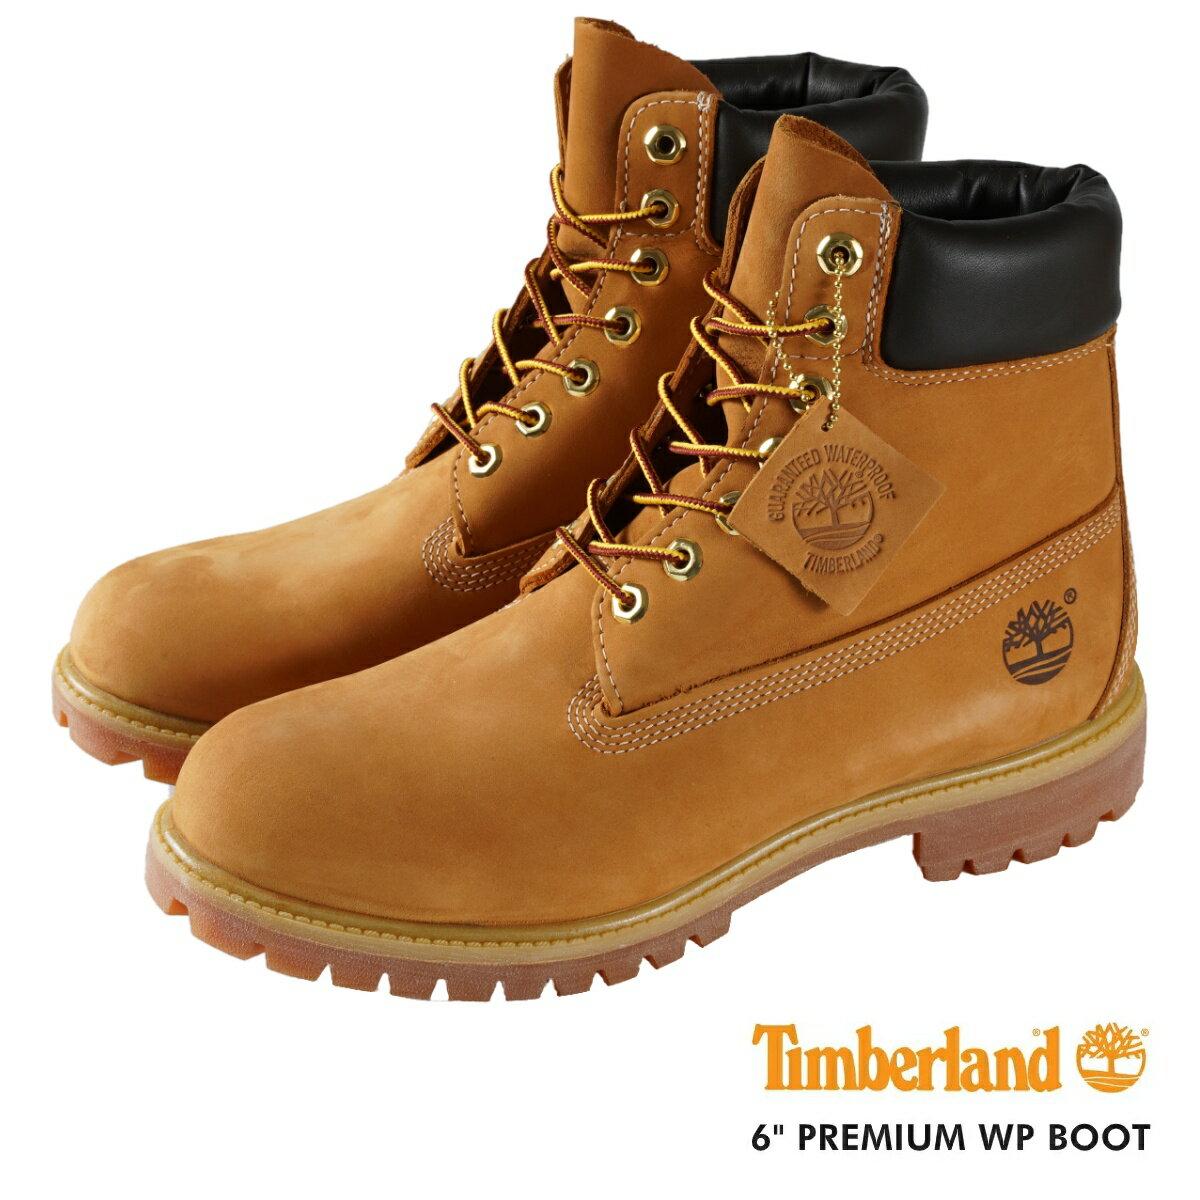 TIMBERLAND 6inch PREMIUM BOOT ティンバーランド 6インチ ブーツ 10061 WHEAT